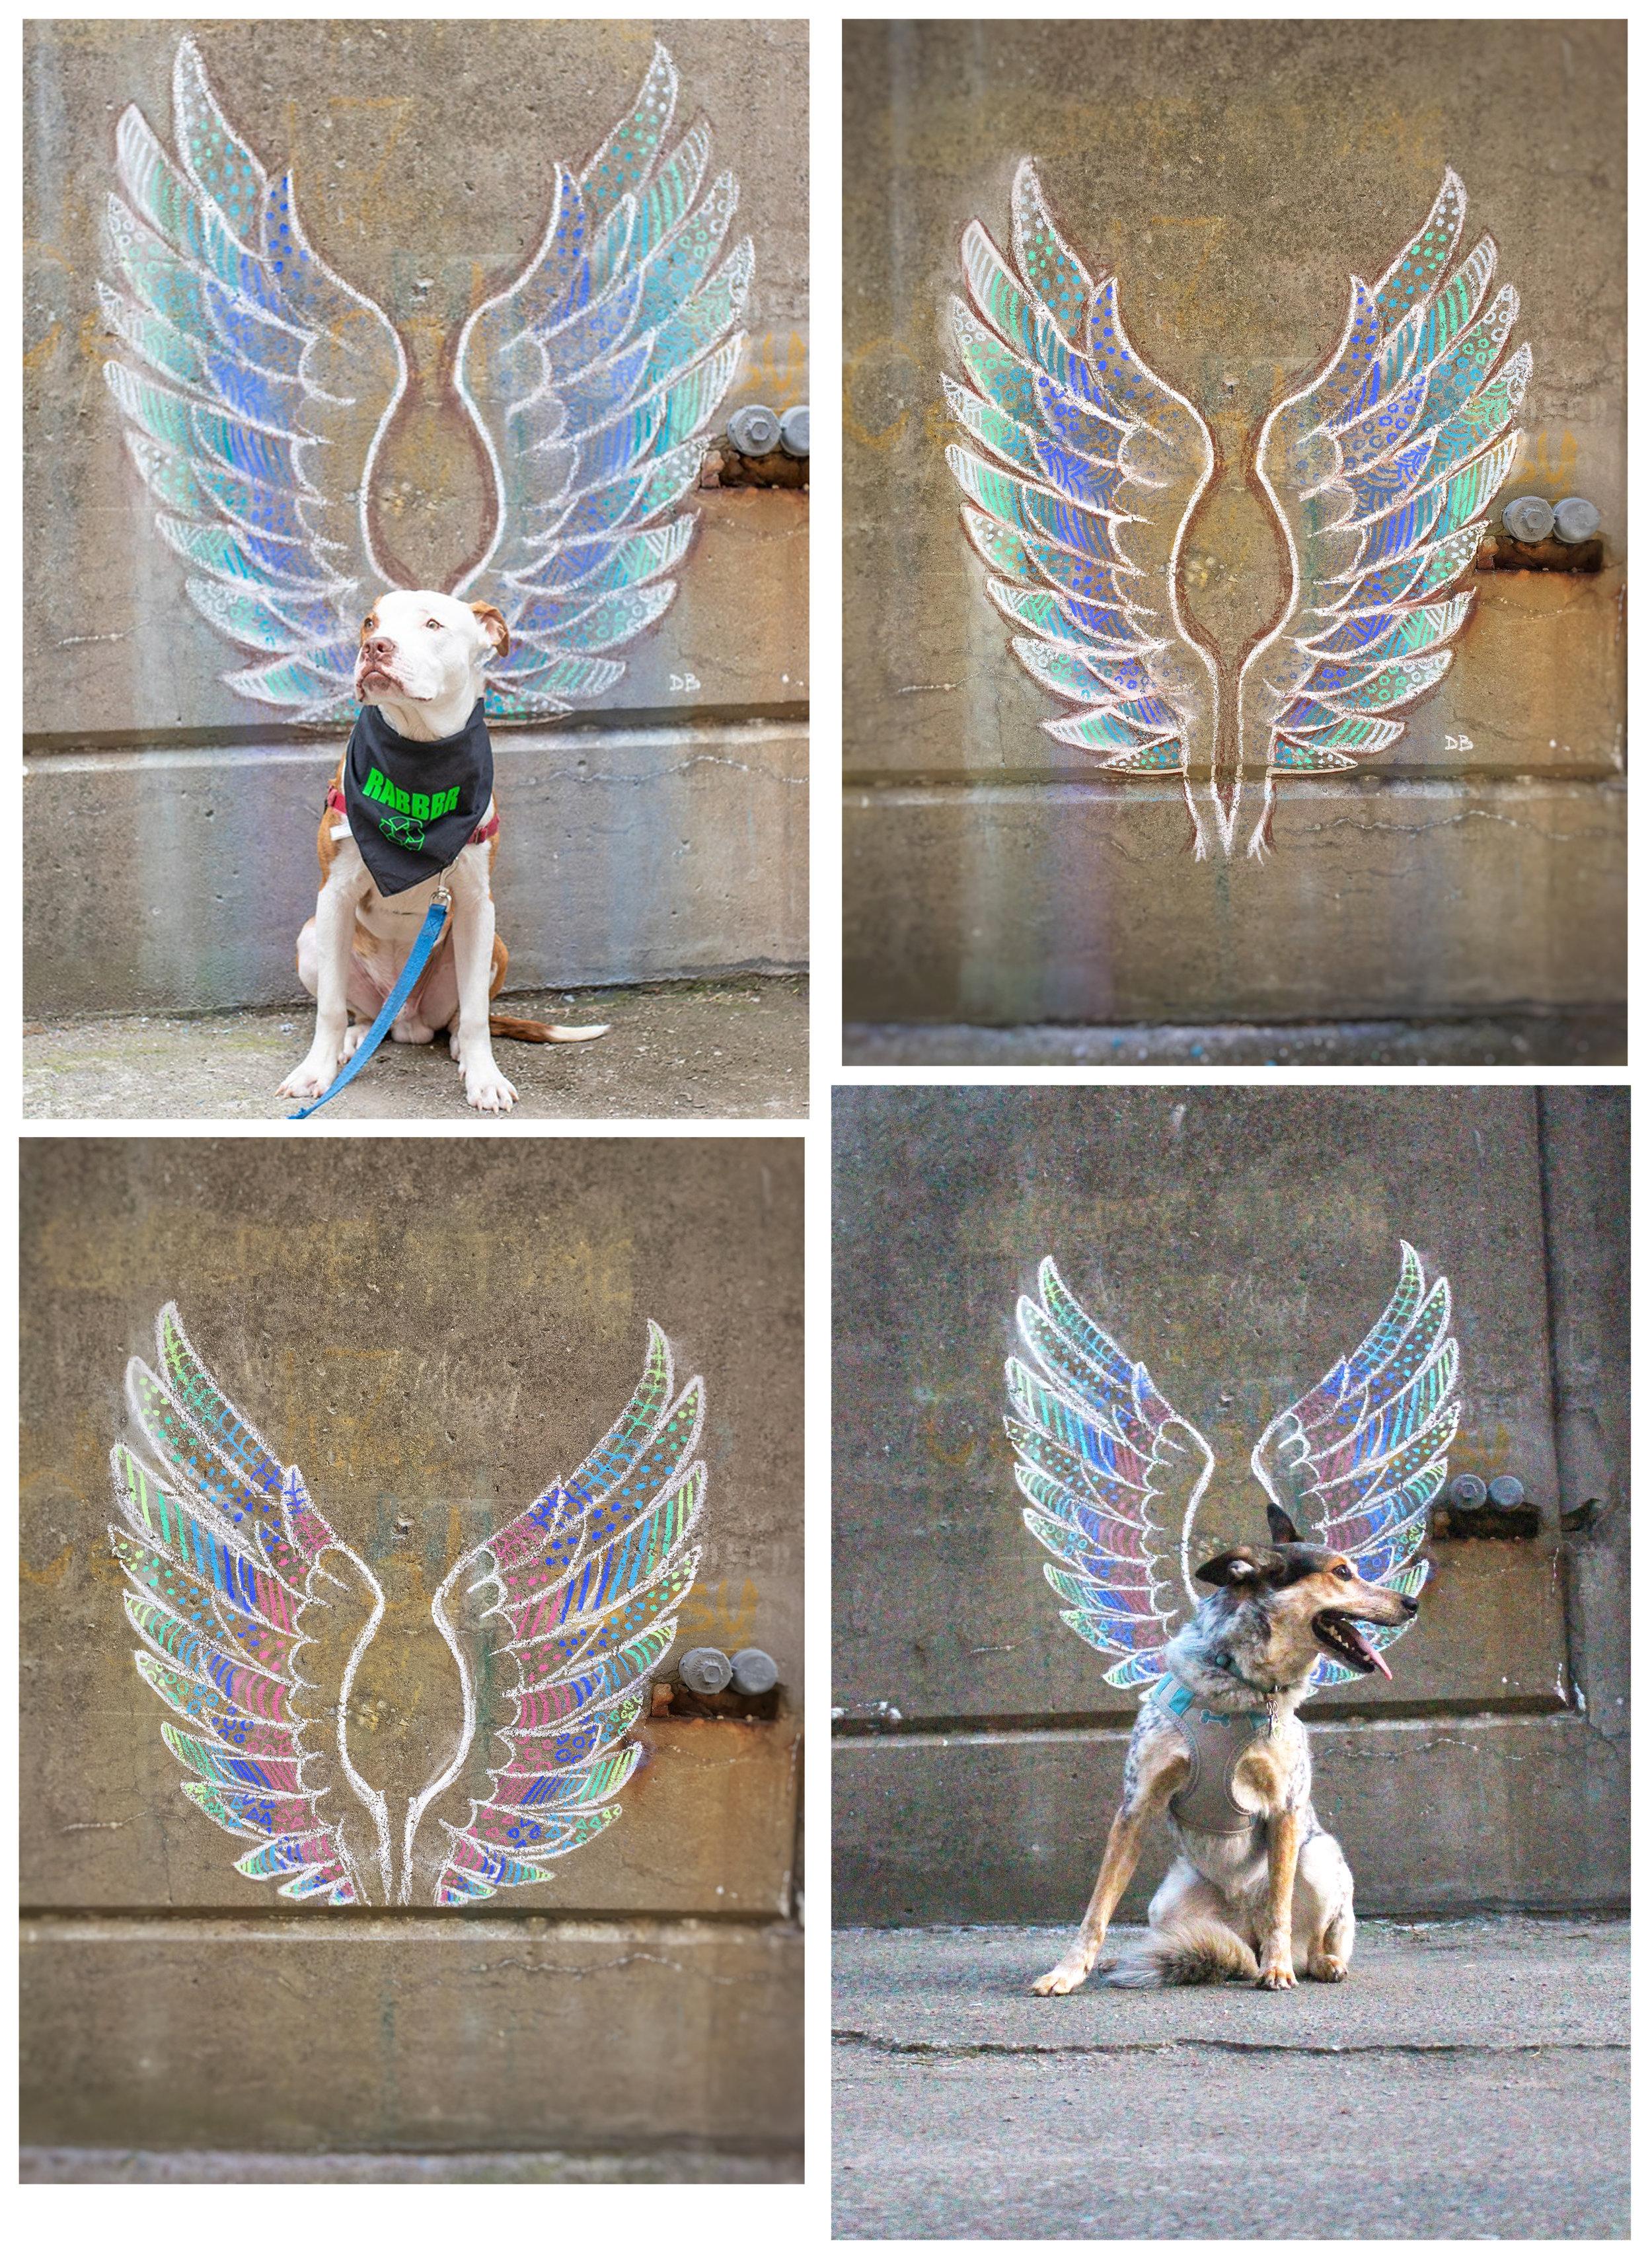 Dog Wings Chalkbomb